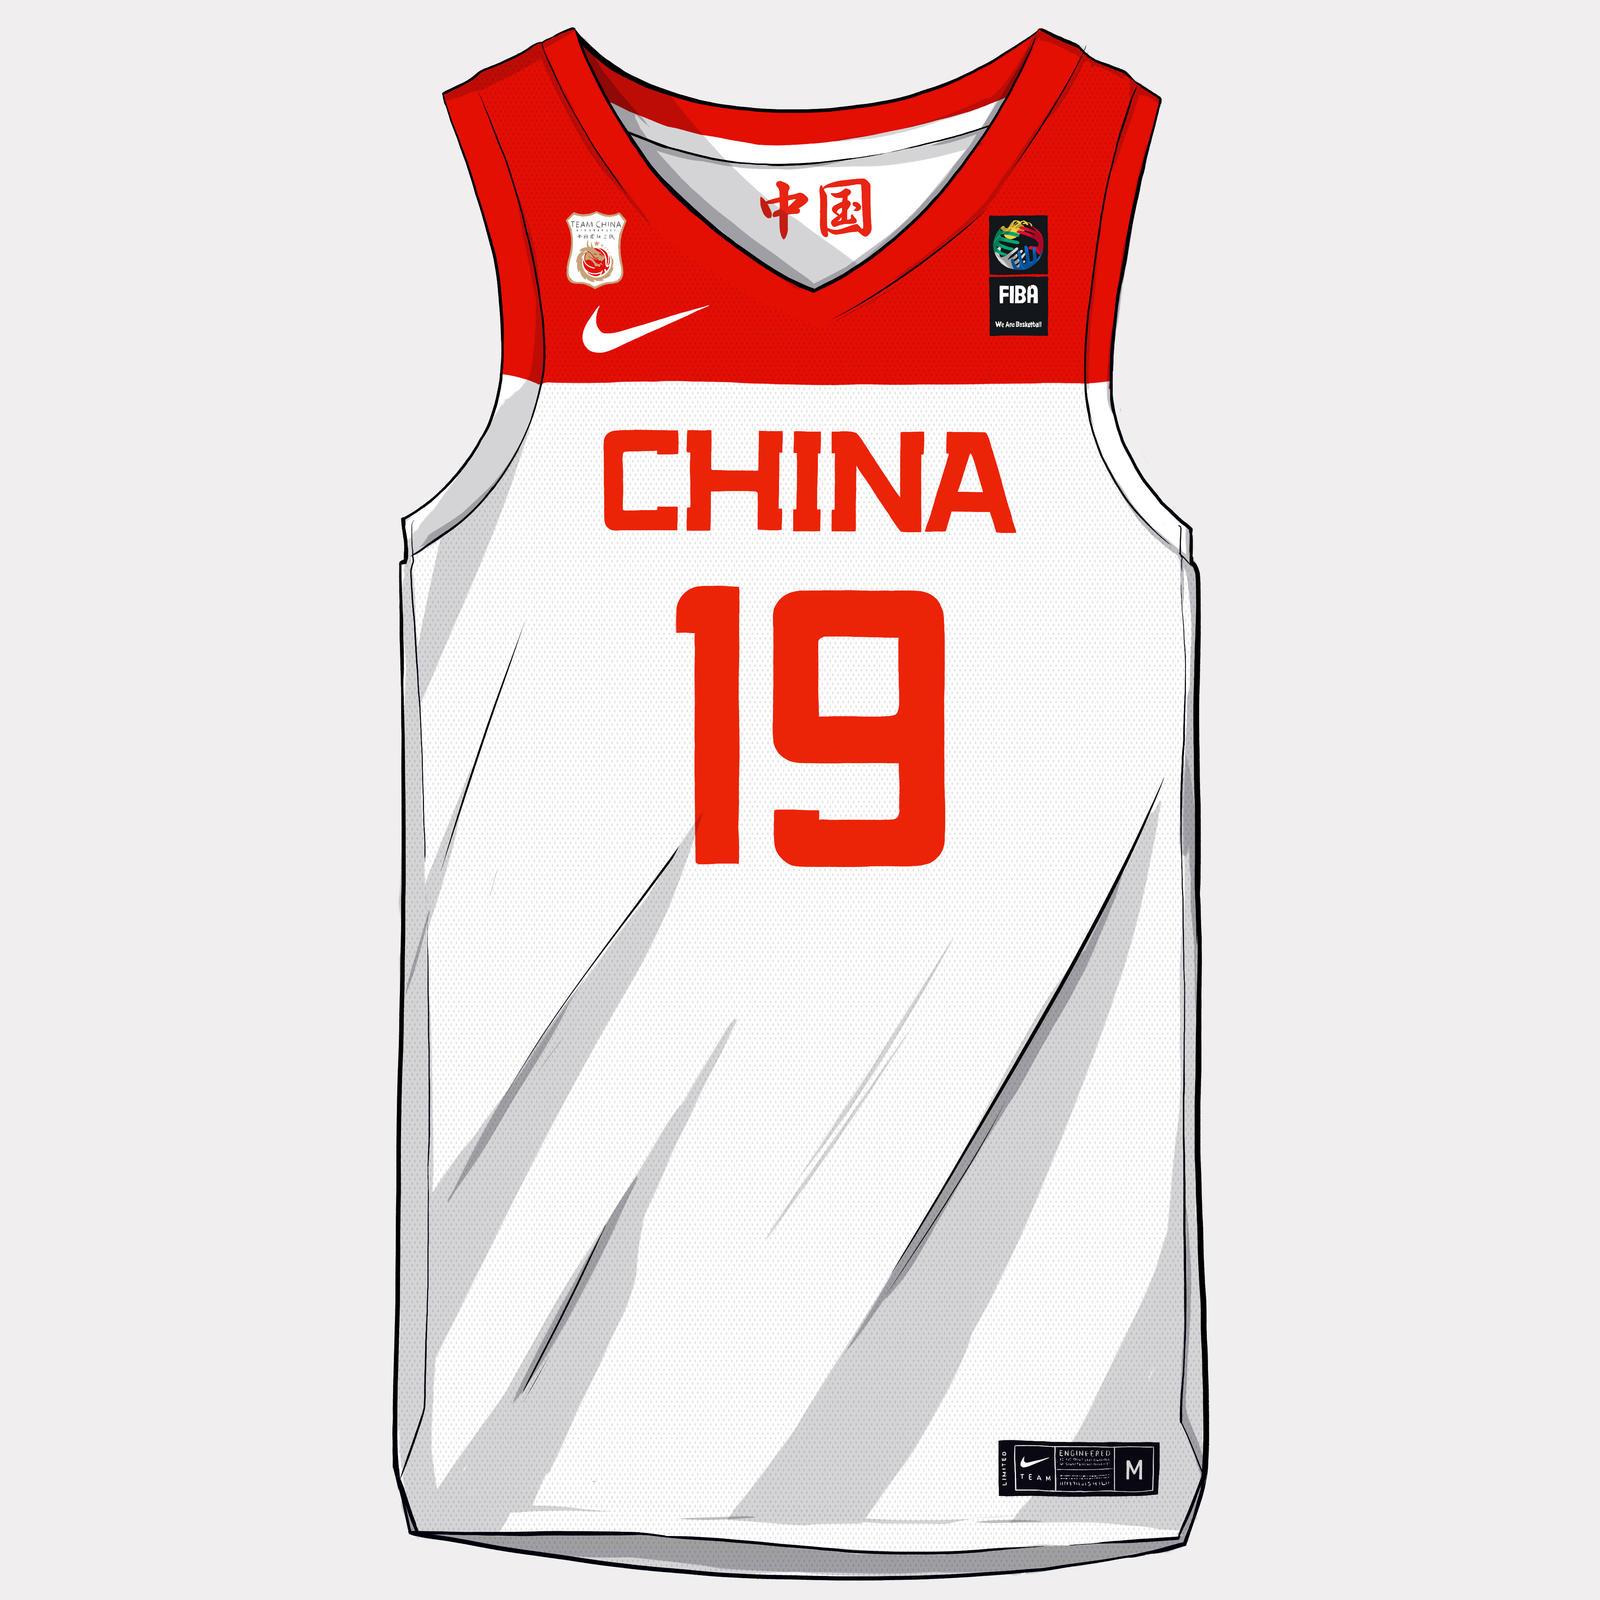 NikeNews_China19BasketballUniforms_chinawhite1x1v2_89681.jpg